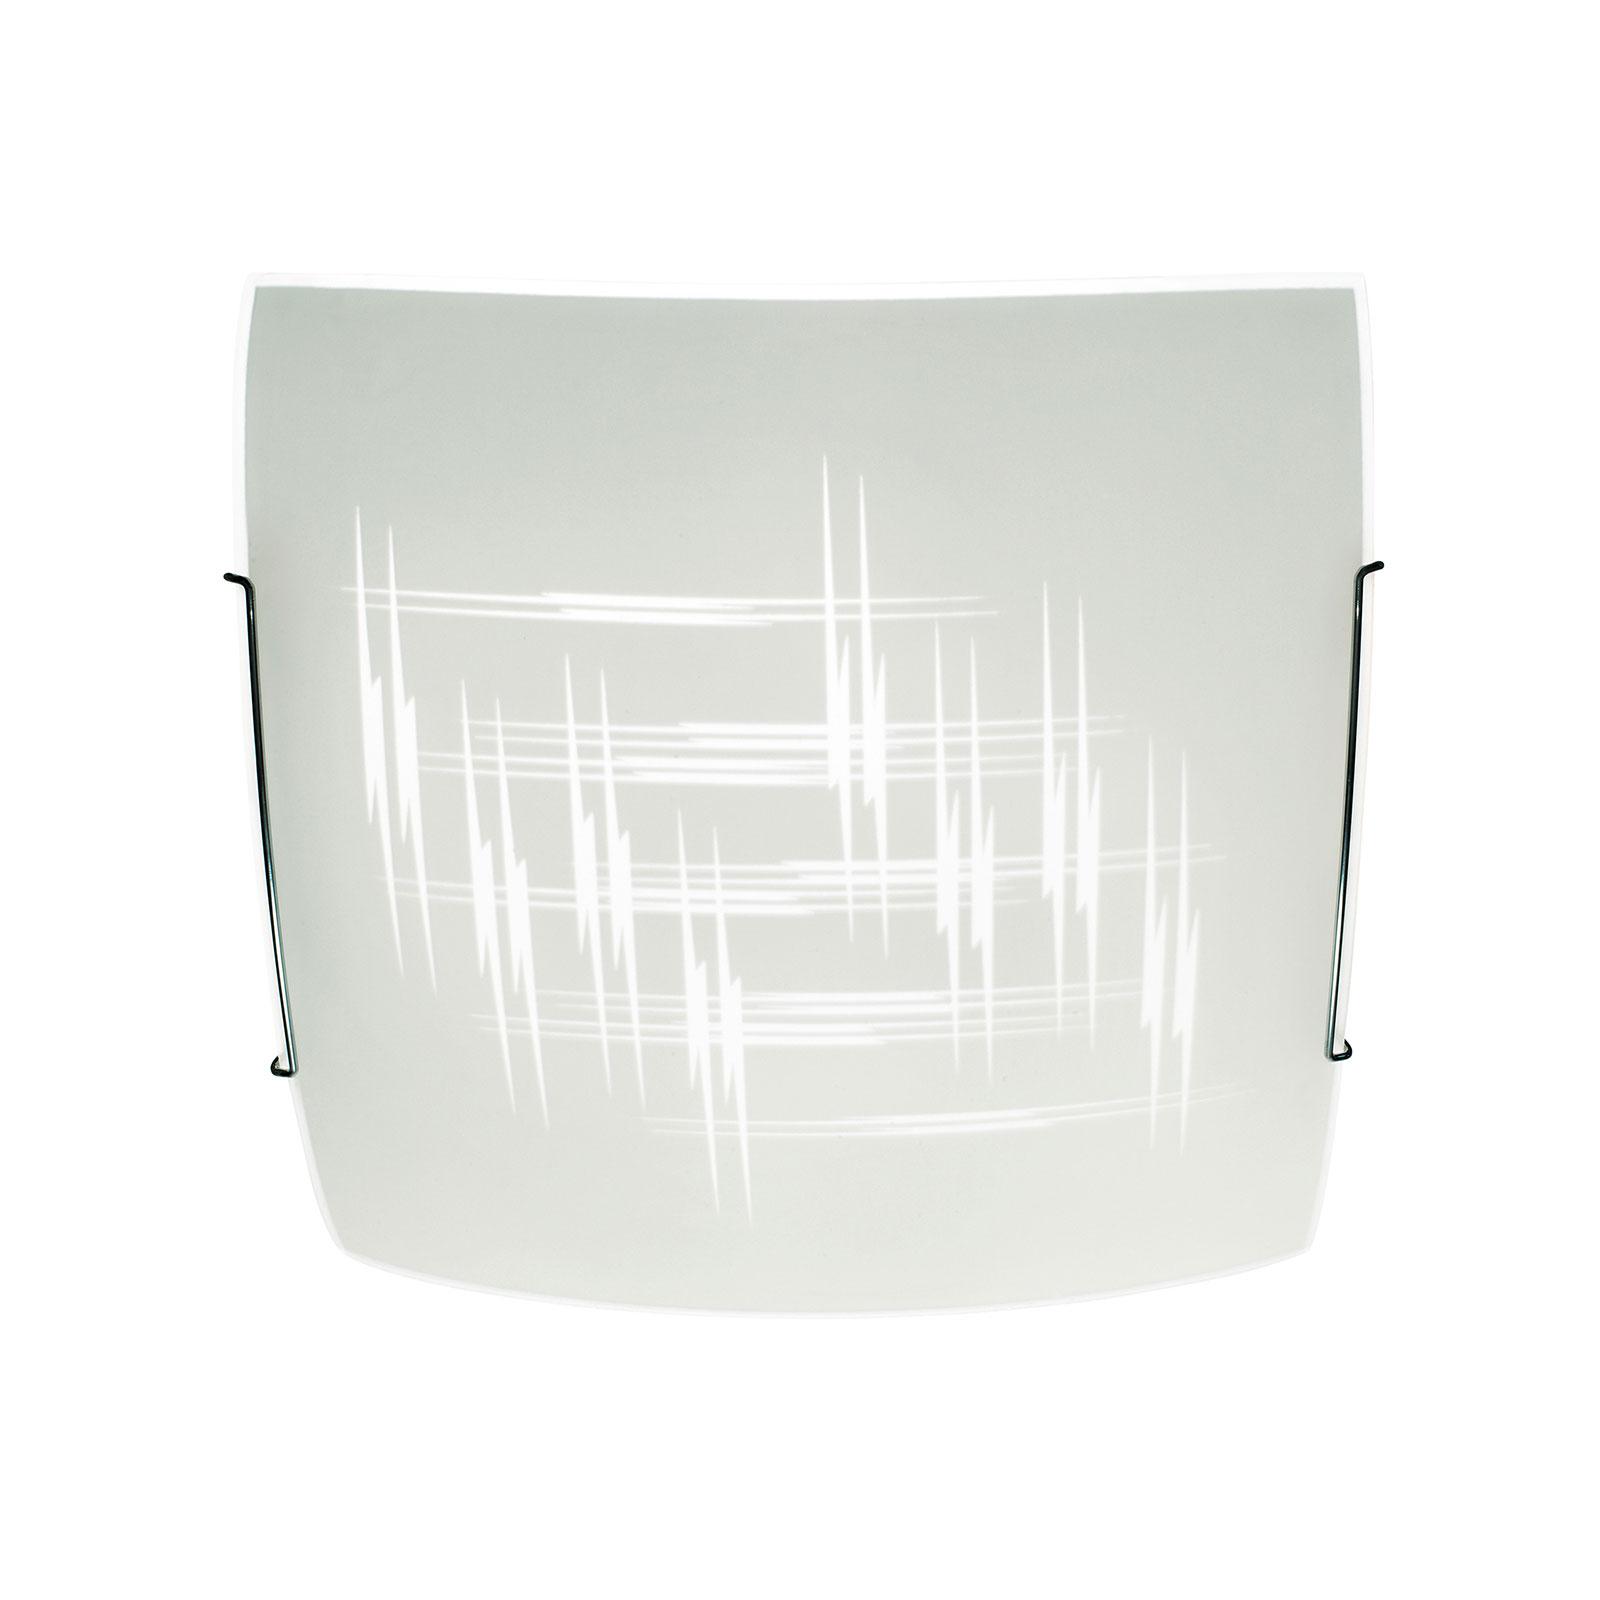 Kattovalaisin Scratch lasista, 30x30cm